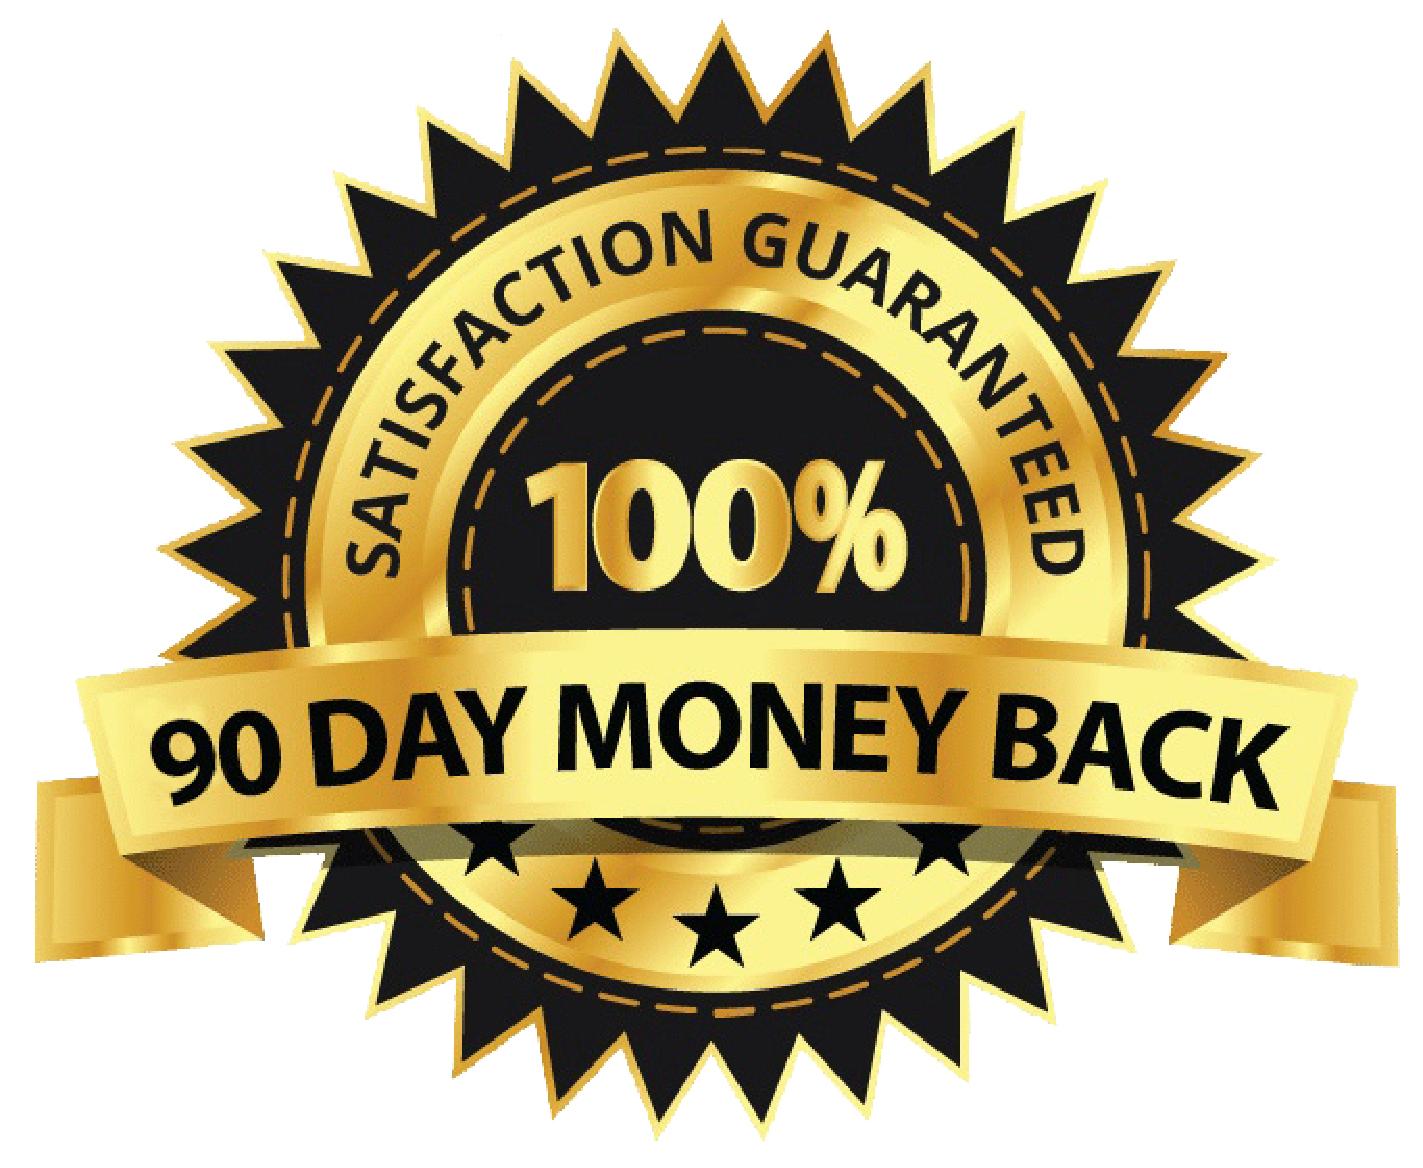 Satisfaction-Guaranteed-90-day-money-back-seal.jpg